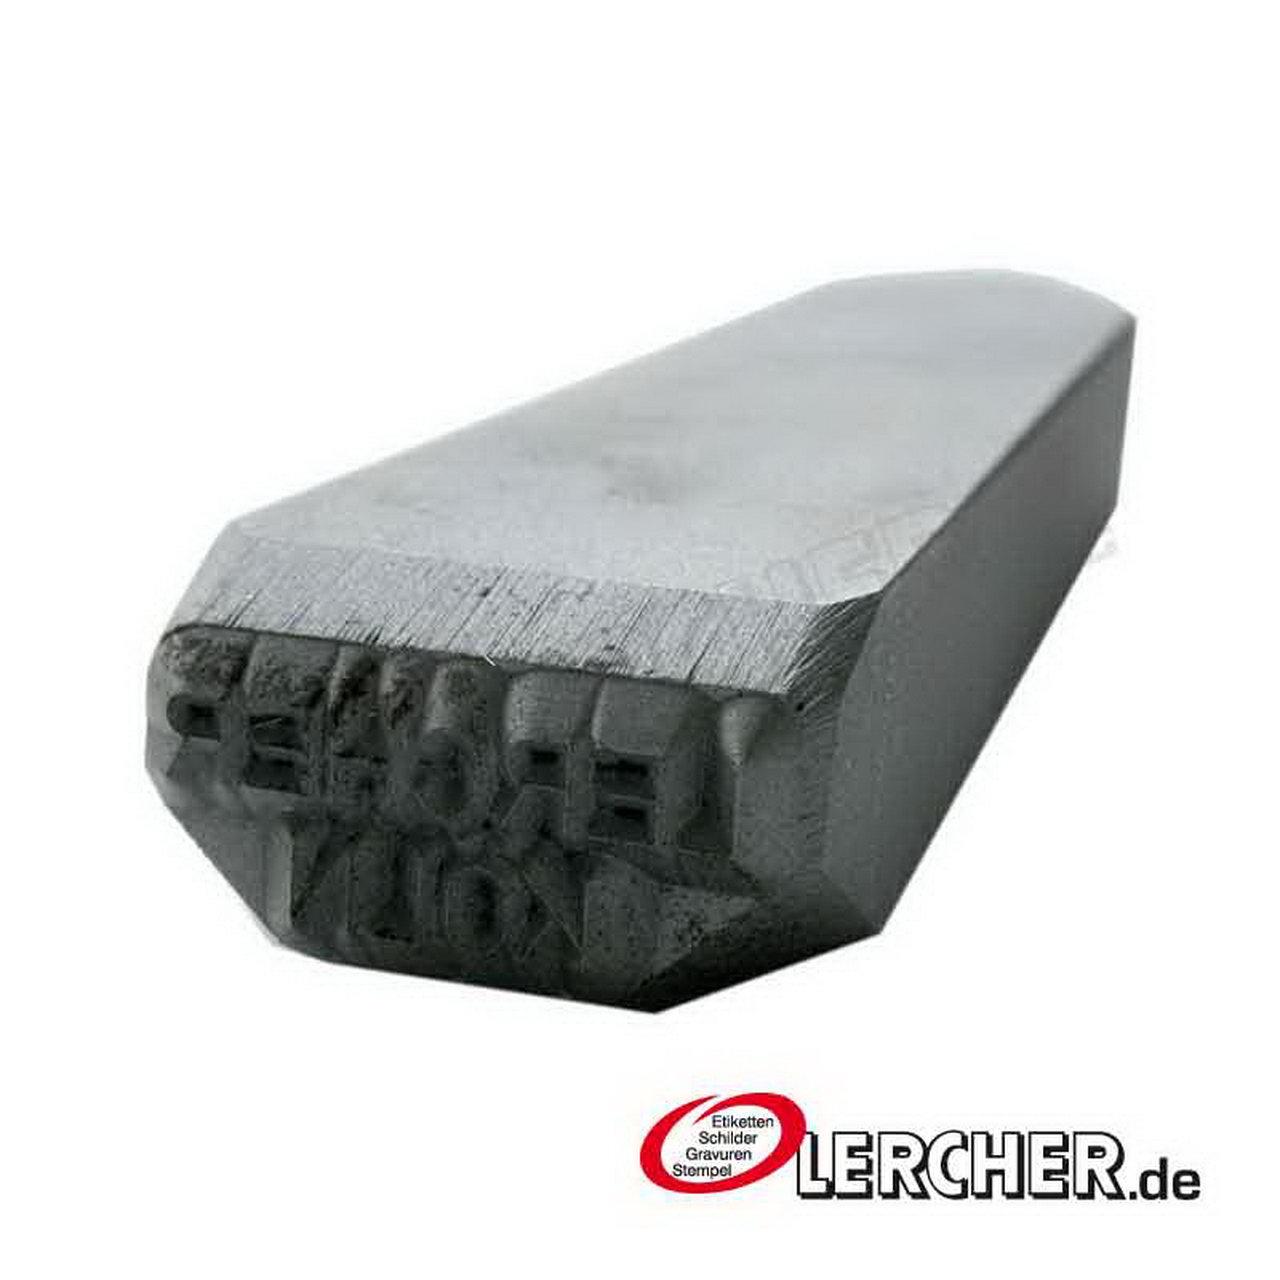 schlagstempel-2-zeilig-lercher-koeln.jpg